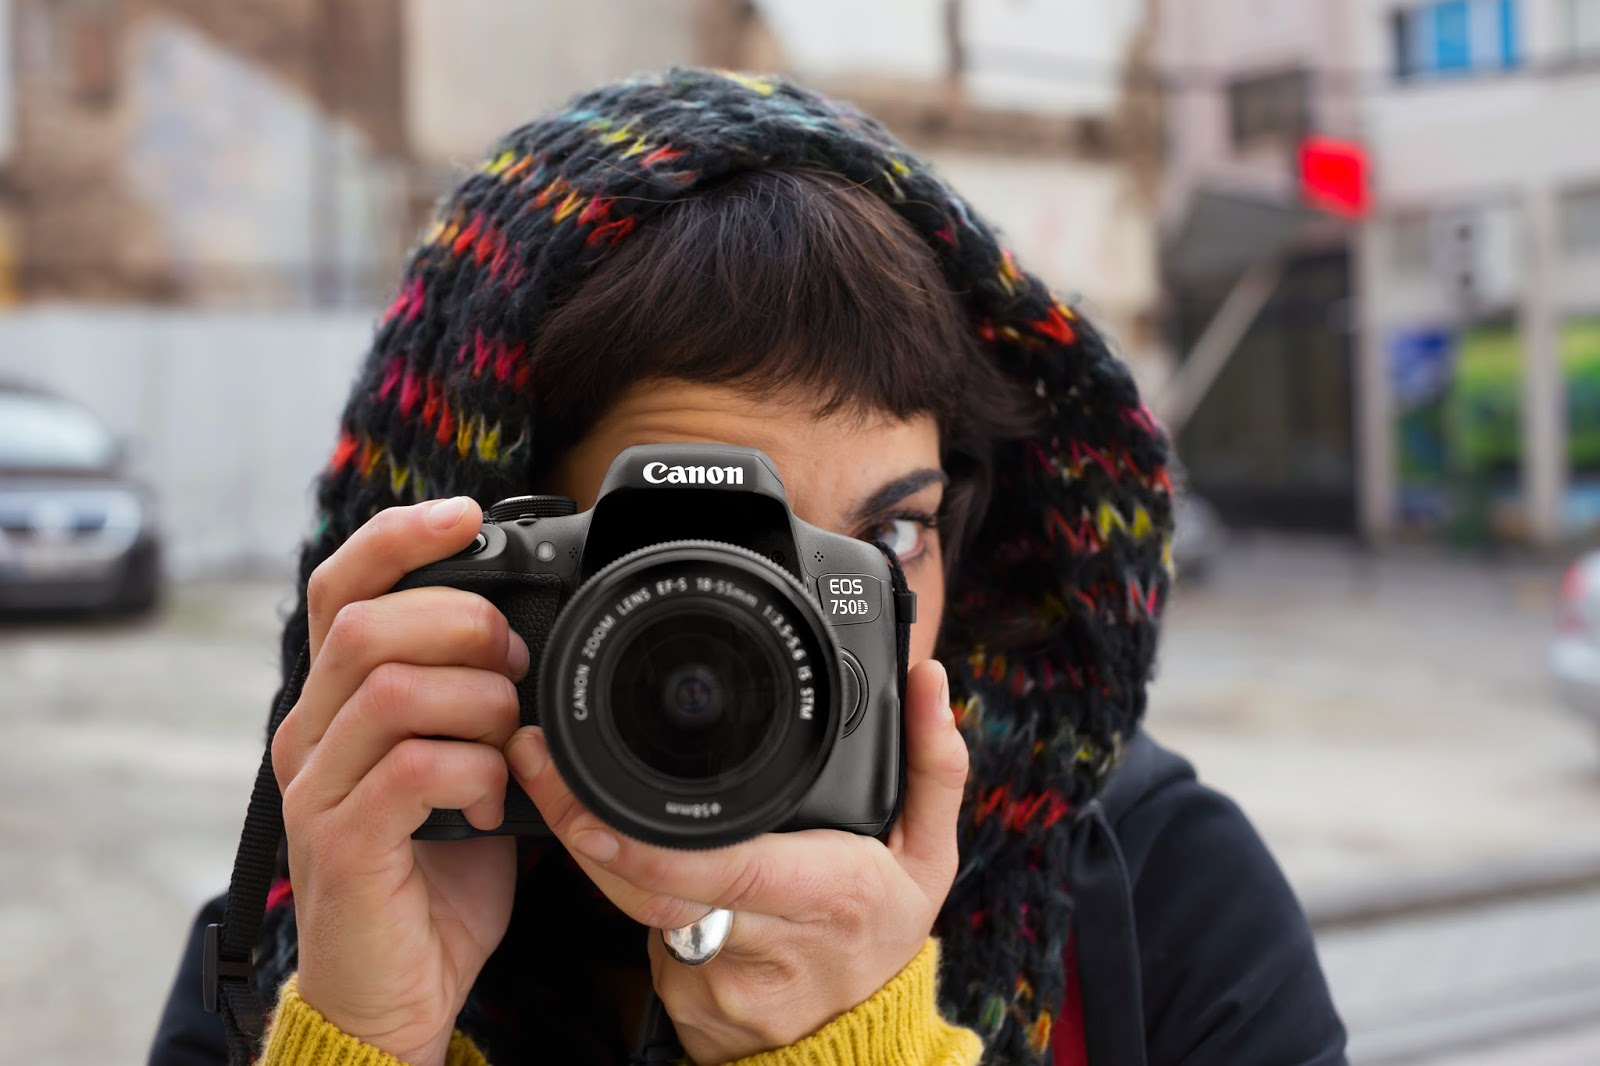 Canon EOS 750D vs Nikon D810 to inspire budding photographers ...